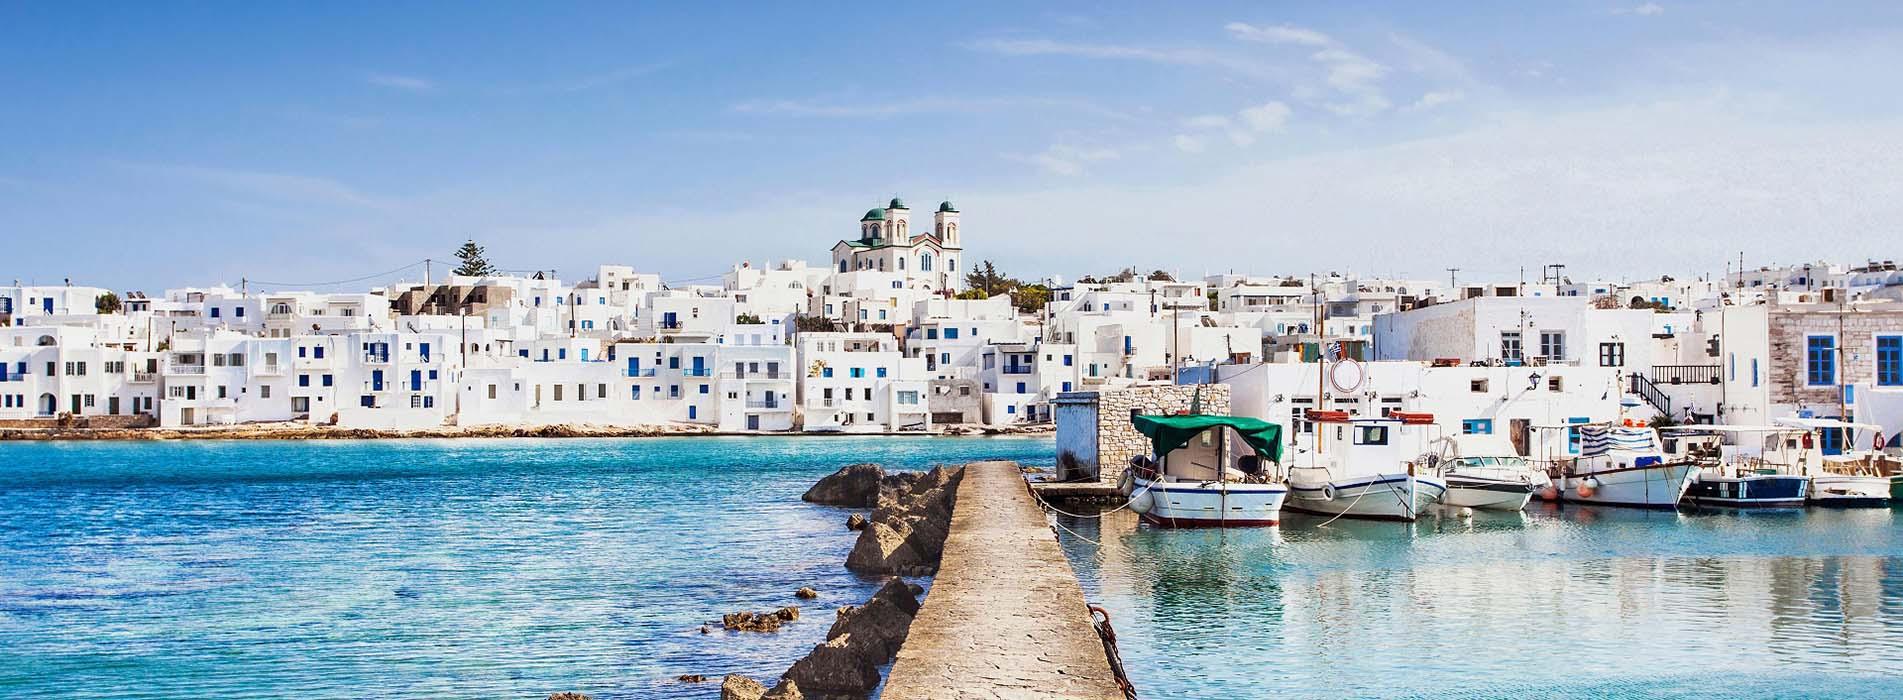 Greece - Paros 5 (main)